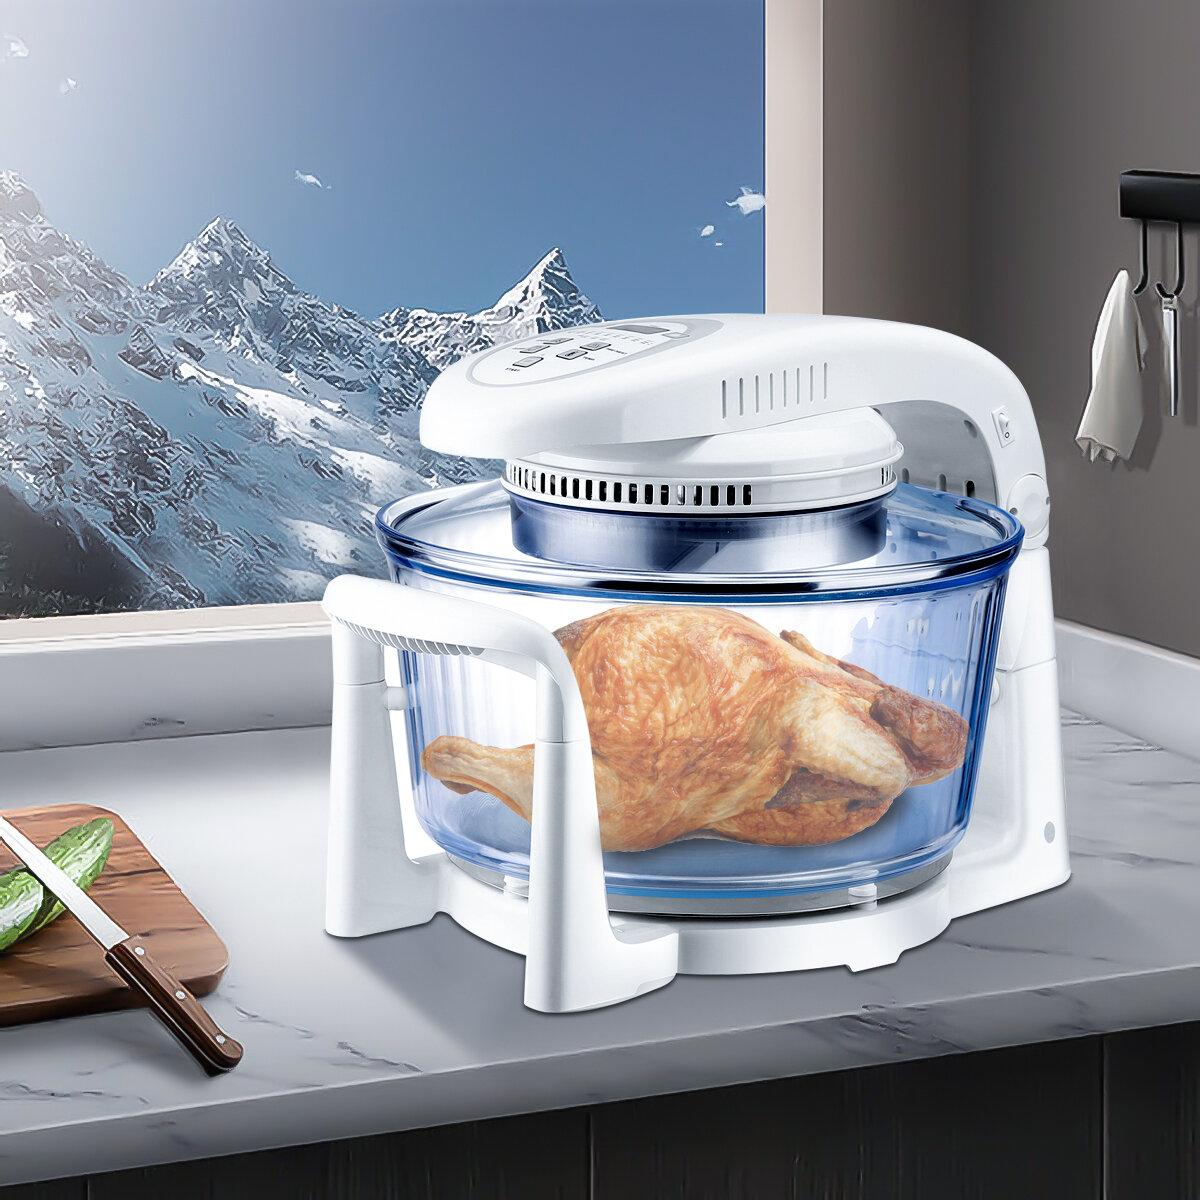 Air Fryer Rotisserie Grilling Holder Roaster Parts Oven Baking Rotating Mesh